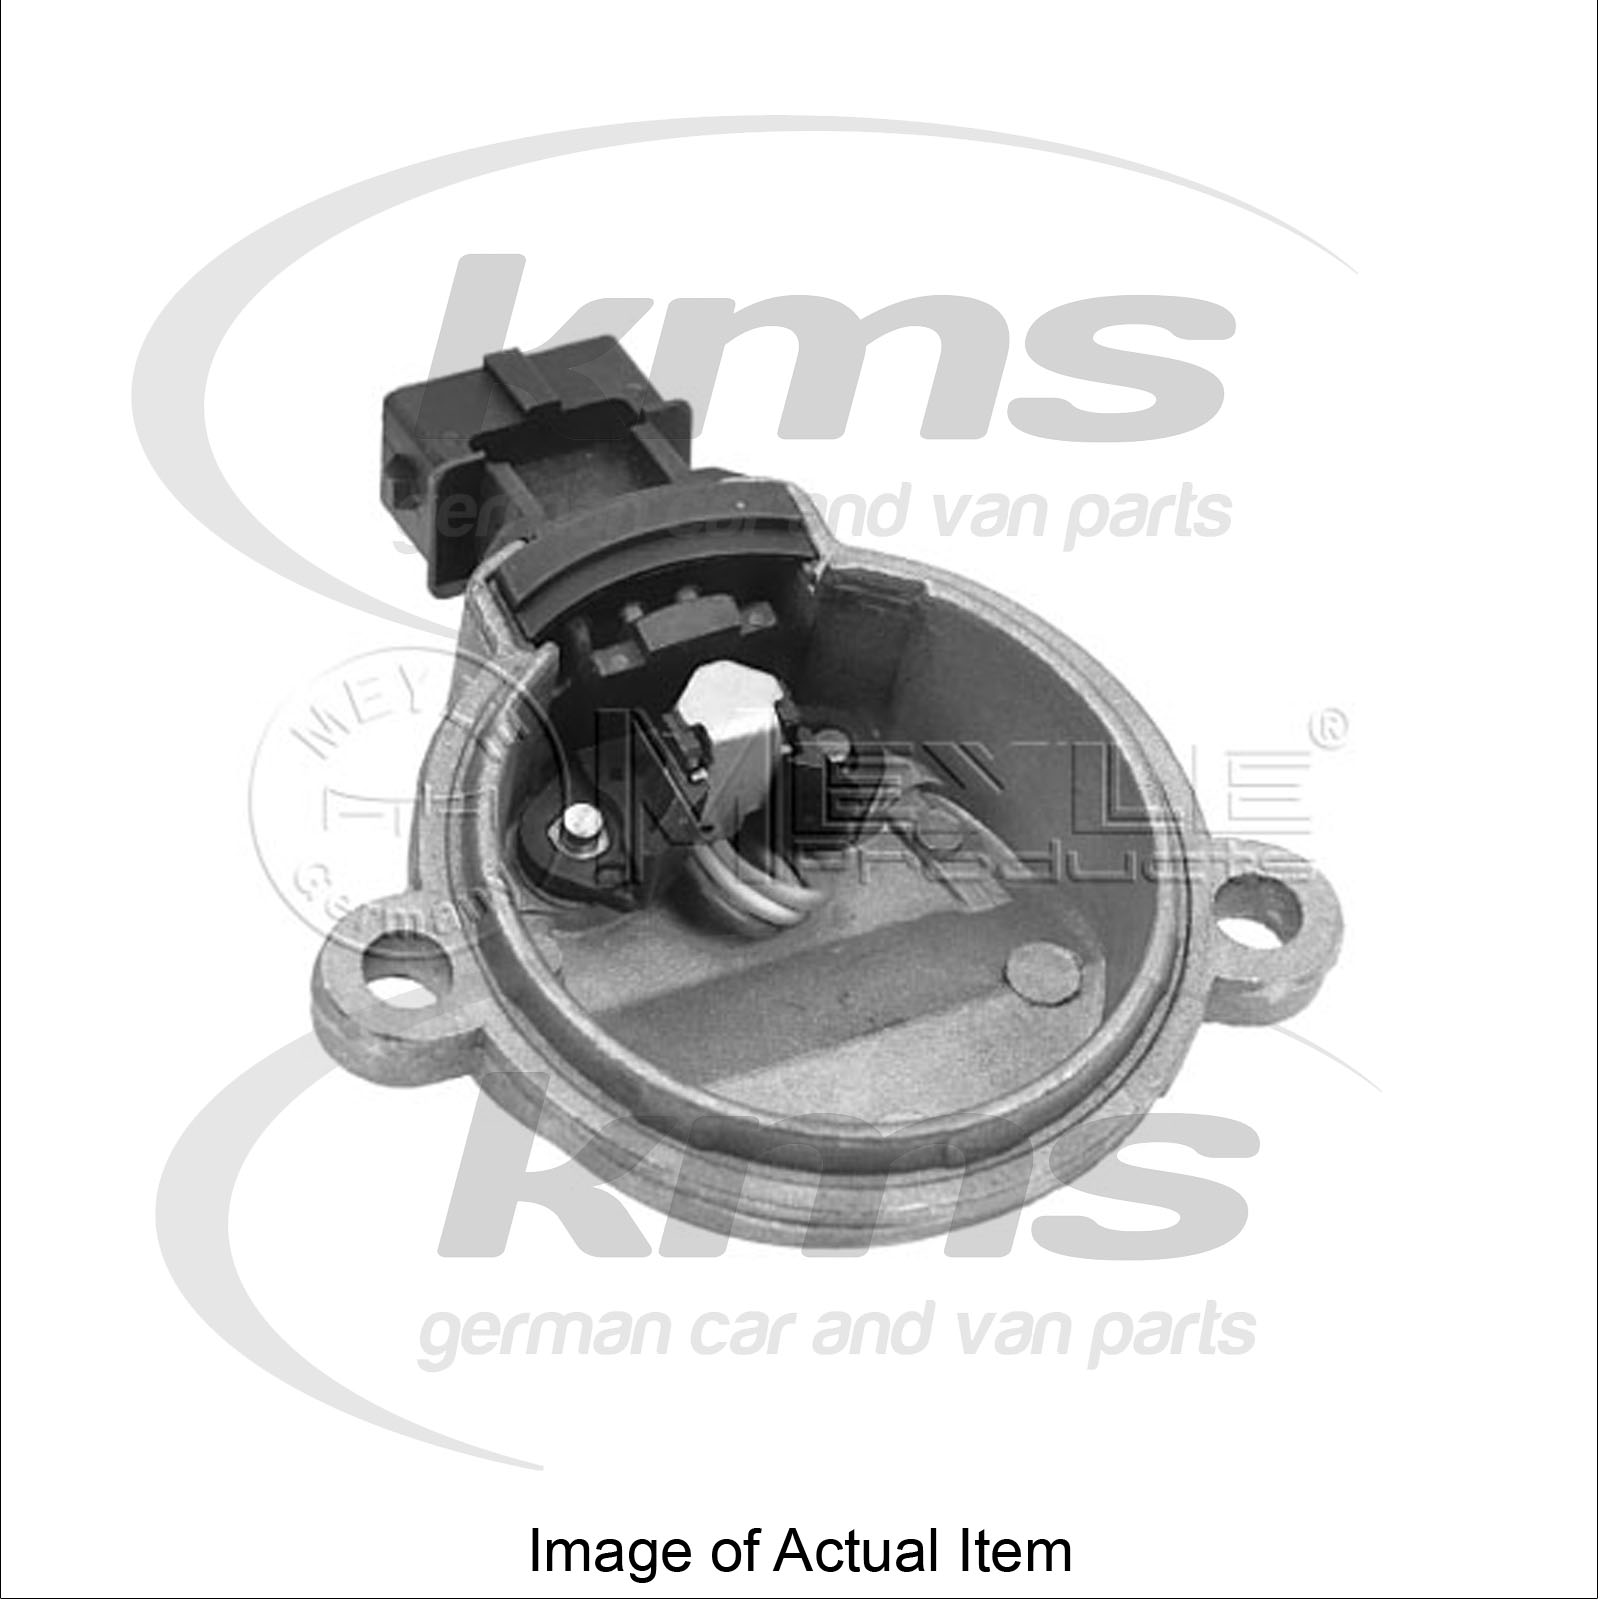 SENSOR For CAMSHAFT POSITION AUDI A6 (4A, C4) 2.8 174BHP